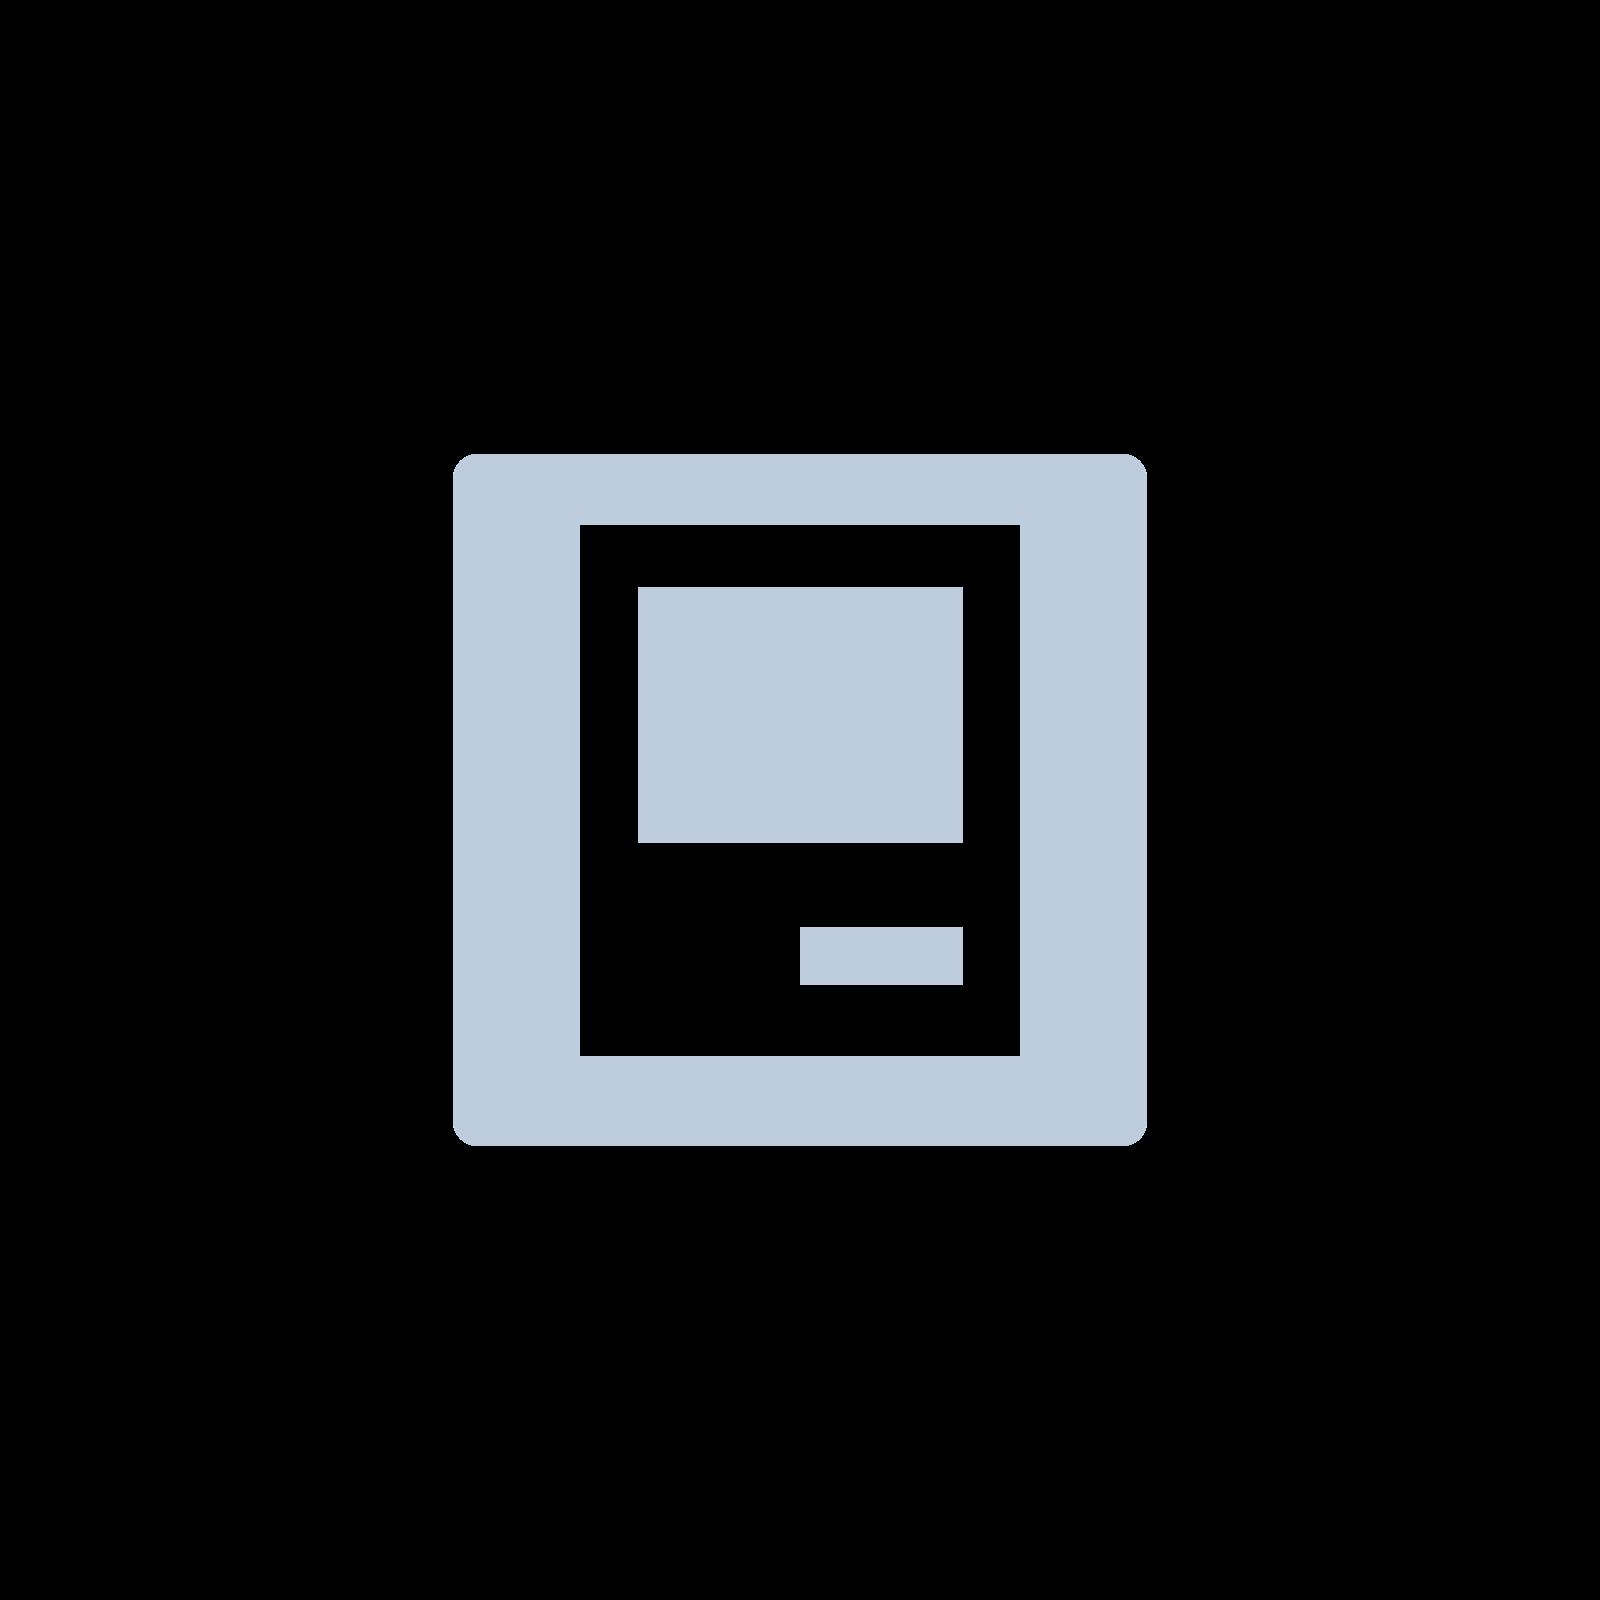 Logitech Create iPad Pro 12,9 Tastatur Case für iPad Pro - Schwarz